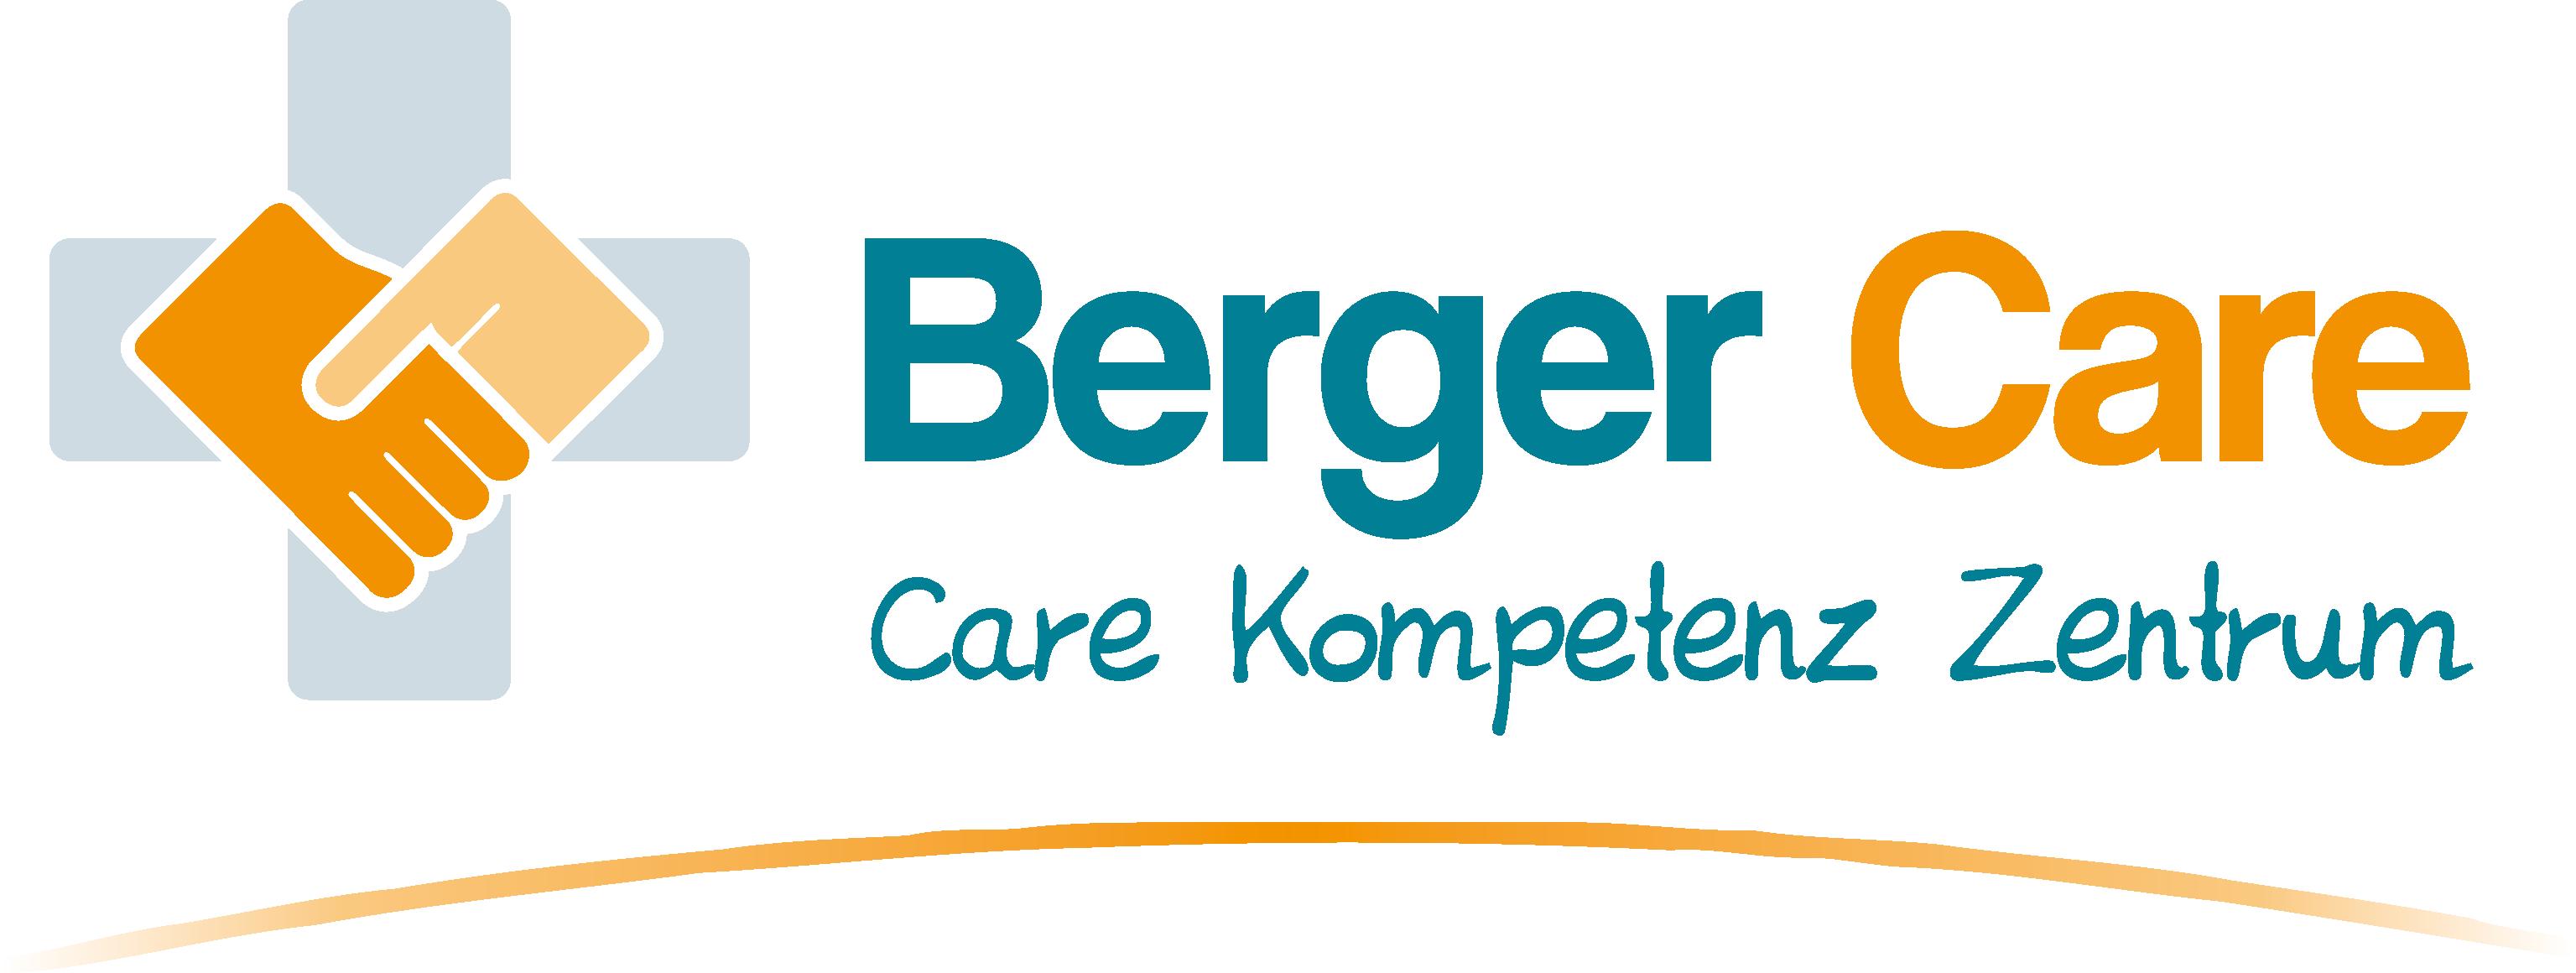 Berger Care